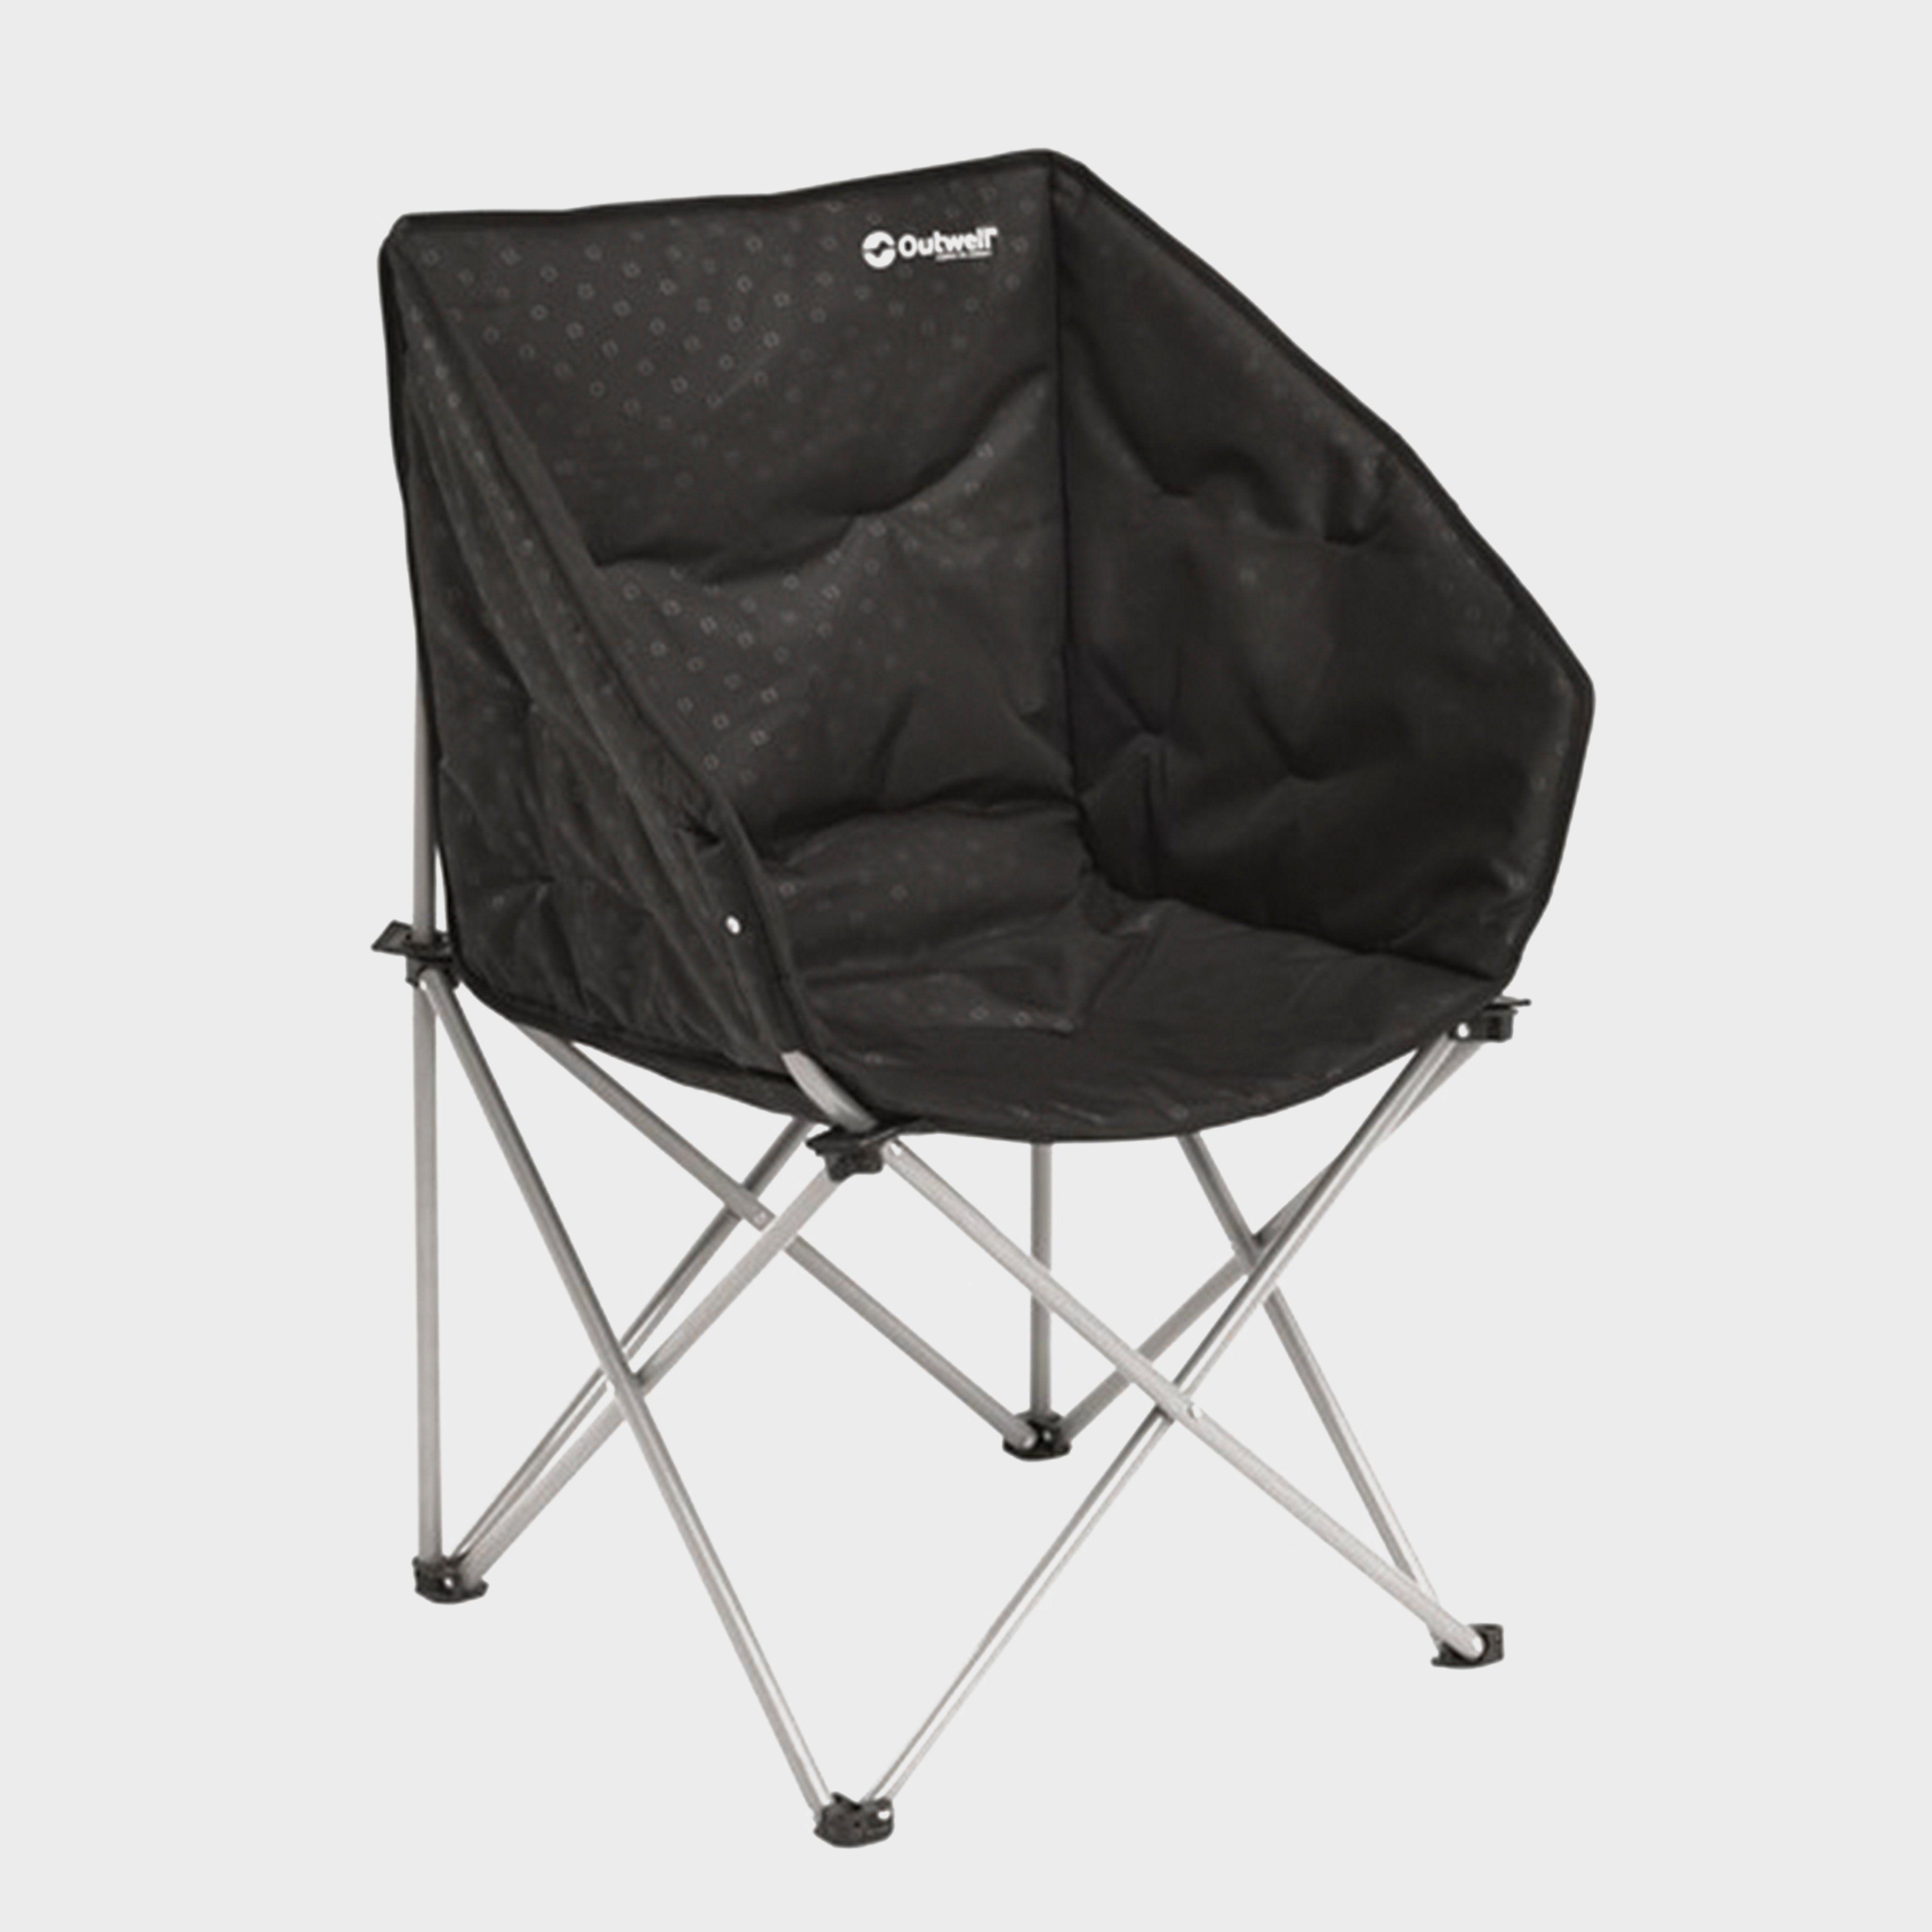 OUTWELL Angela Folding Chair